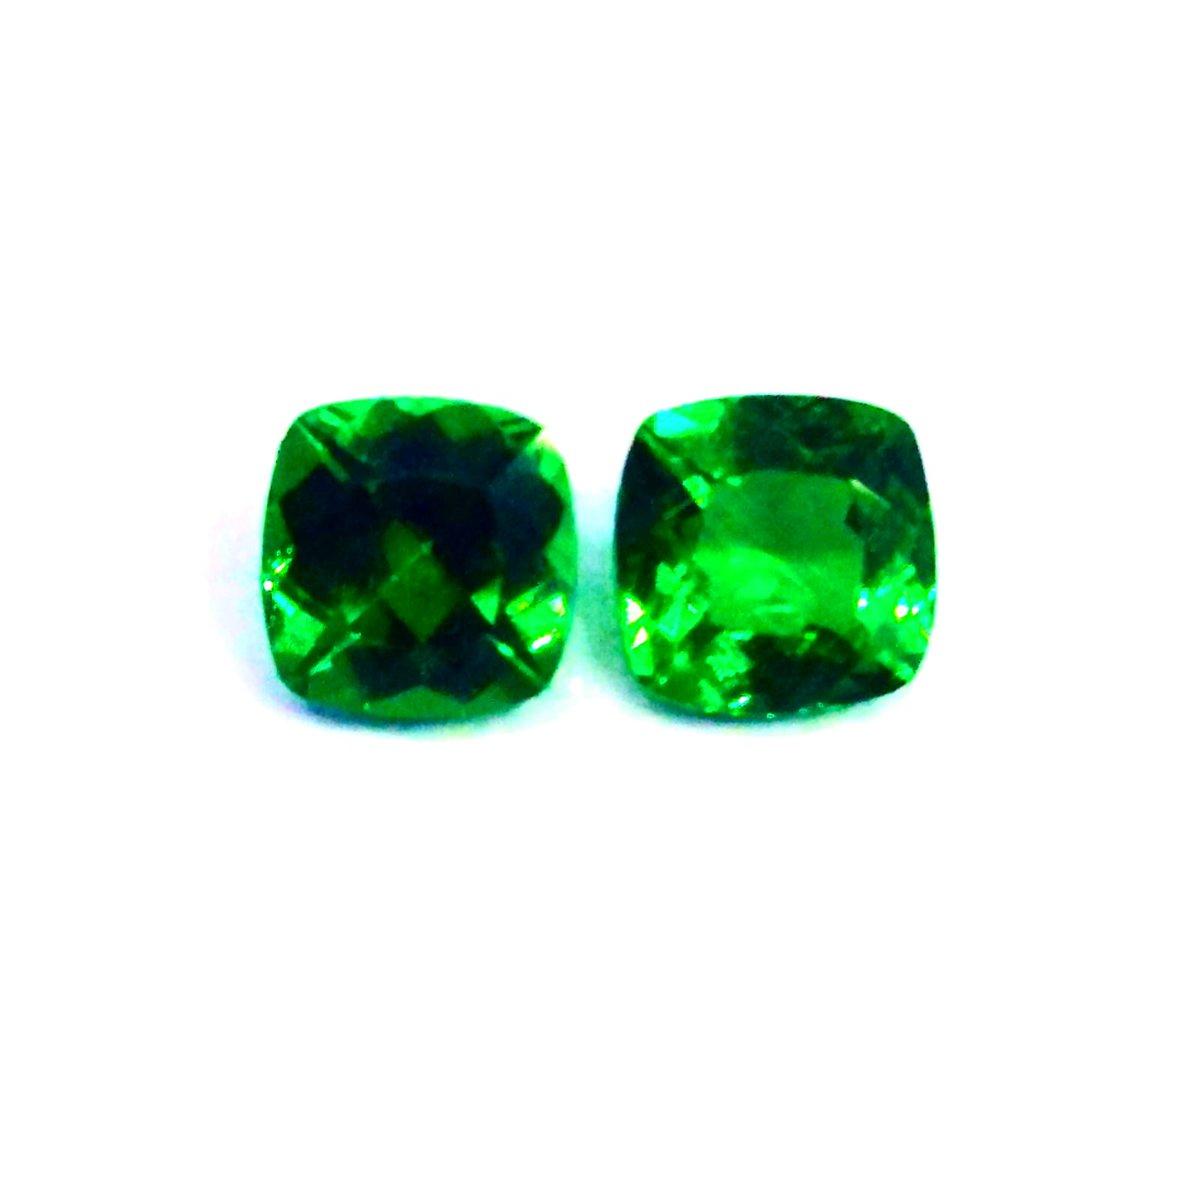 Tsavorite garnet gemstone 0.50 carats. Available now. Shipping Worldwide. Dm me for Purchase or more details   #jewelrydesigner #jeweler #gemstone #gems #jewelry #jewelrydesign #jeweler #tsavorite pic.twitter.com/Fkn45yMmbR